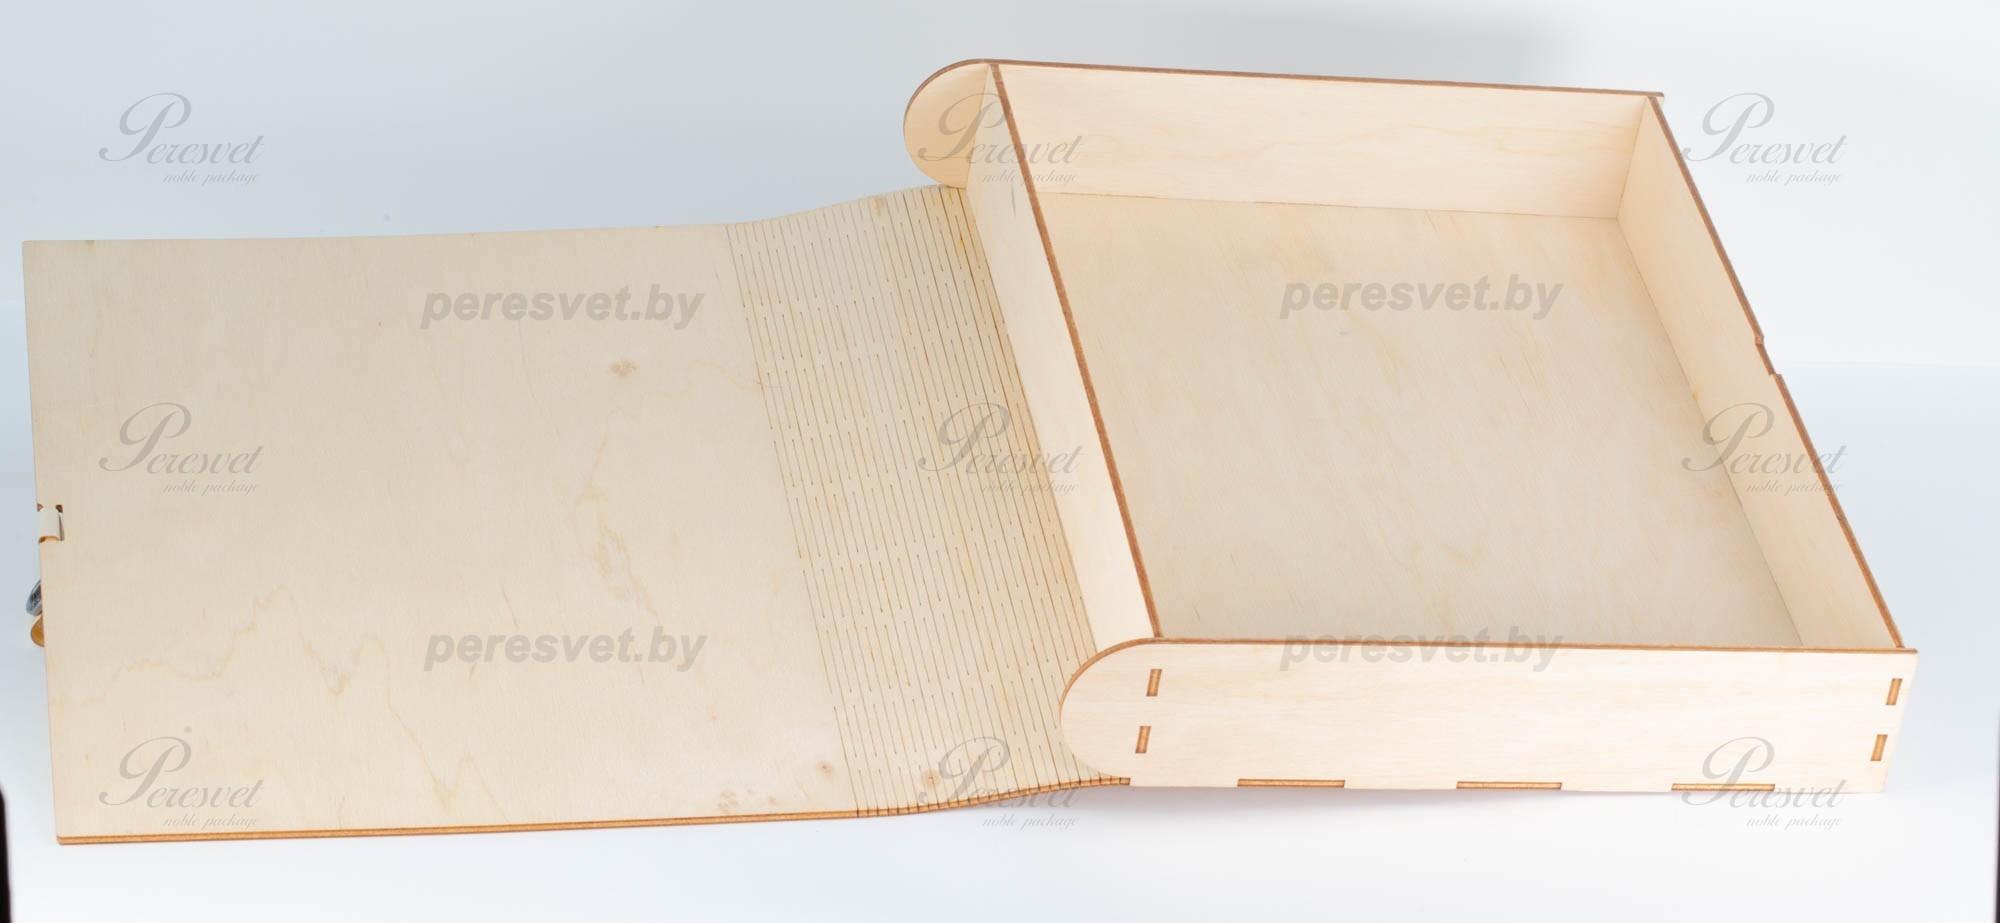 Деревянная упаковка под книгу на застежке на peresvet.by